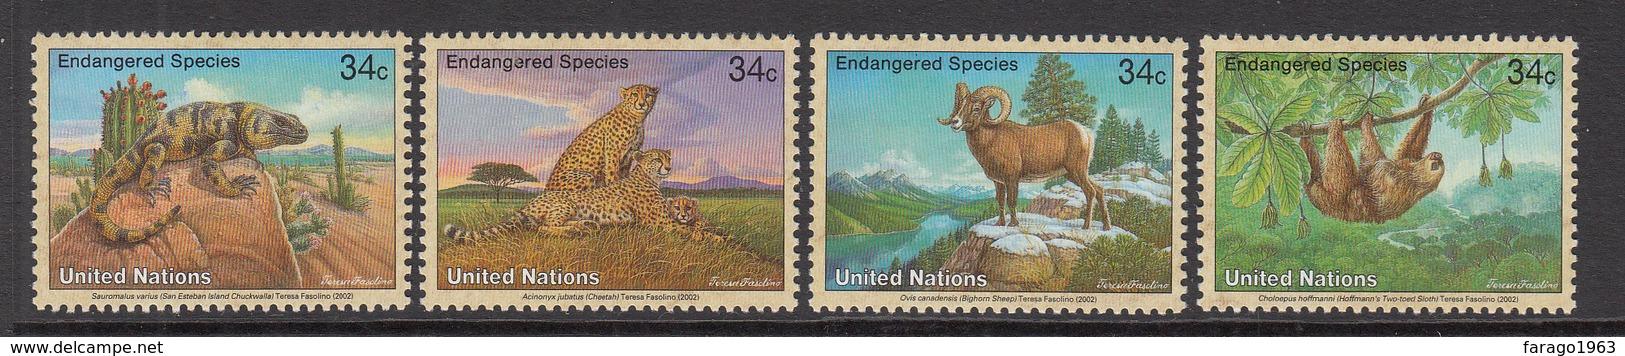 2002 UN New York Endangered Animals Sloth, Sheep, Cheetah, Chuckwalla Set Of 4  MNH - Unclassified